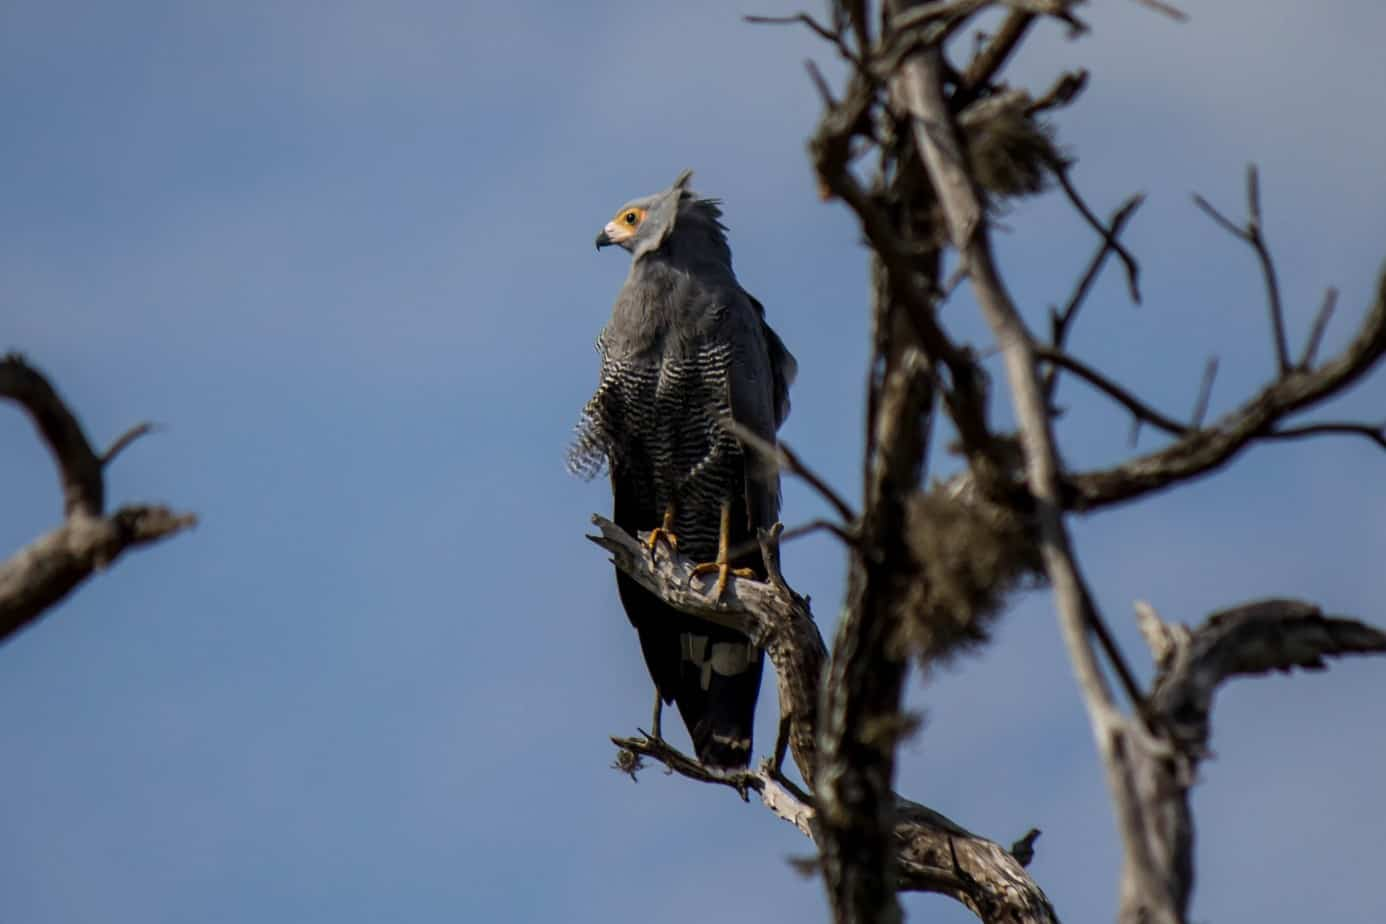 Klatrehauk @ Ndumo Game Reserve, Sør-Afrika. Foto: Håvard Rosenlund